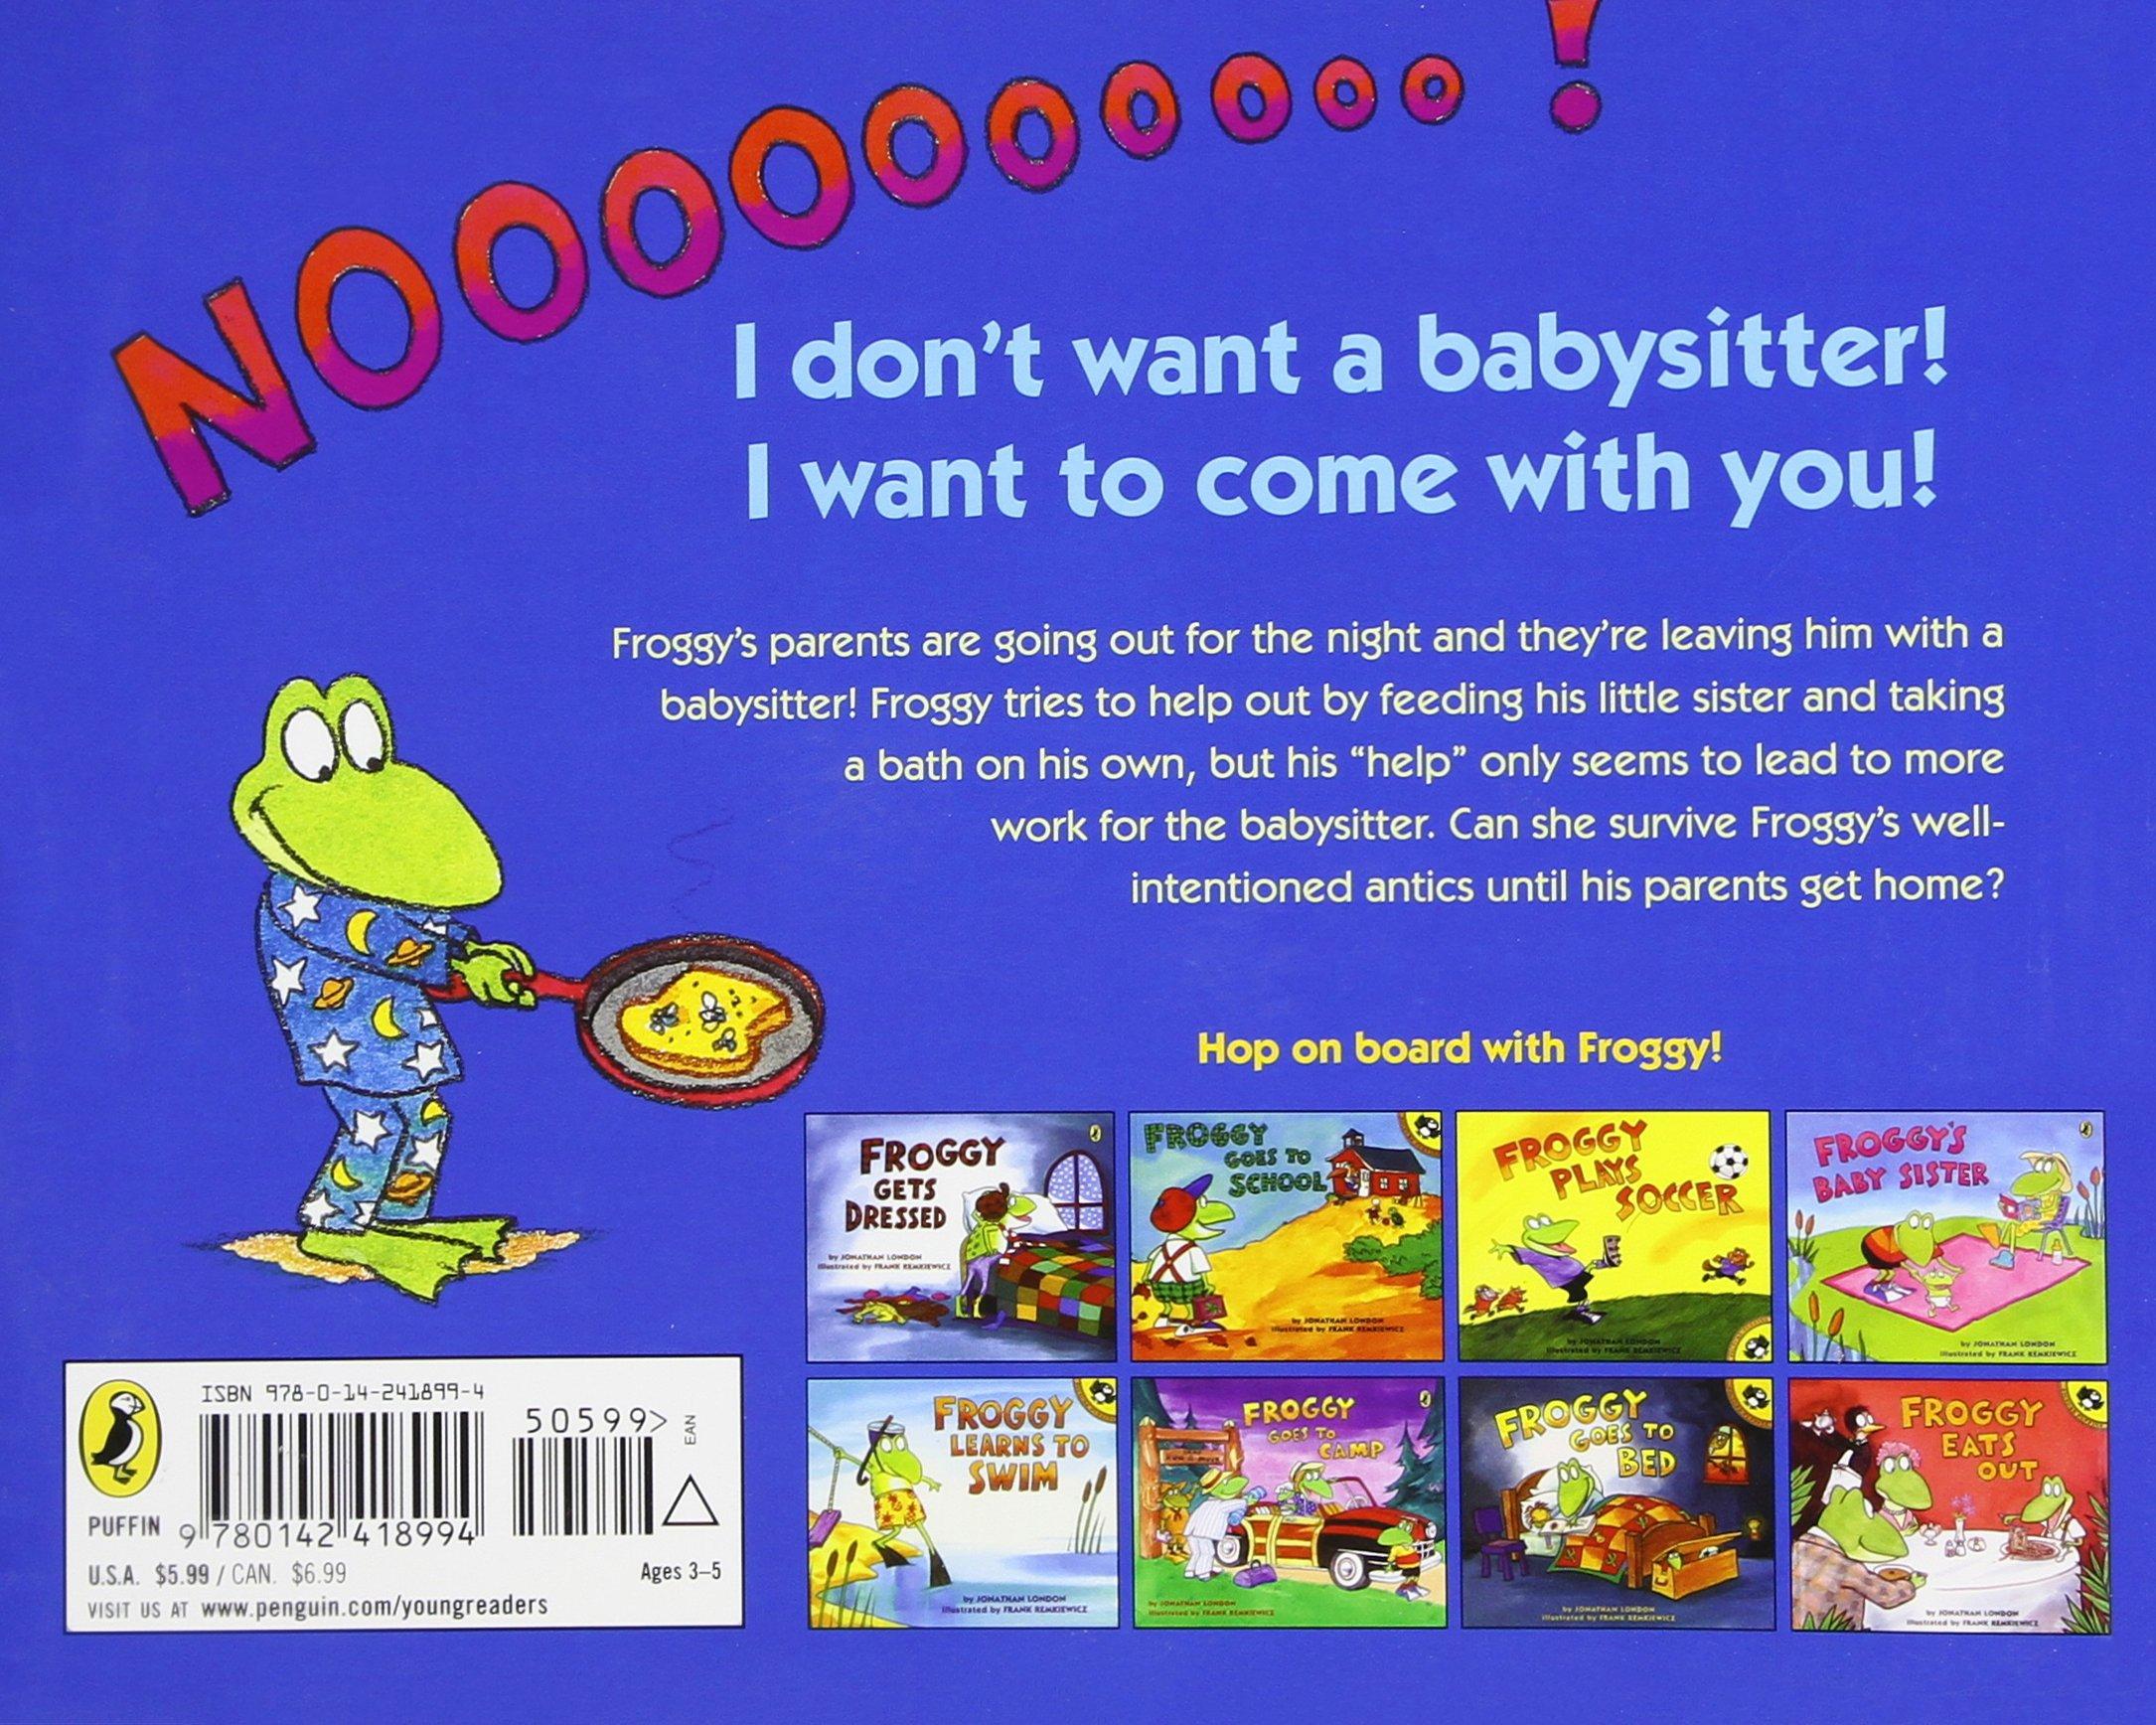 froggy s best babysitter jonathan london frank remkiewicz froggy s best babysitter jonathan london frank remkiewicz 9780142418994 amazon com books